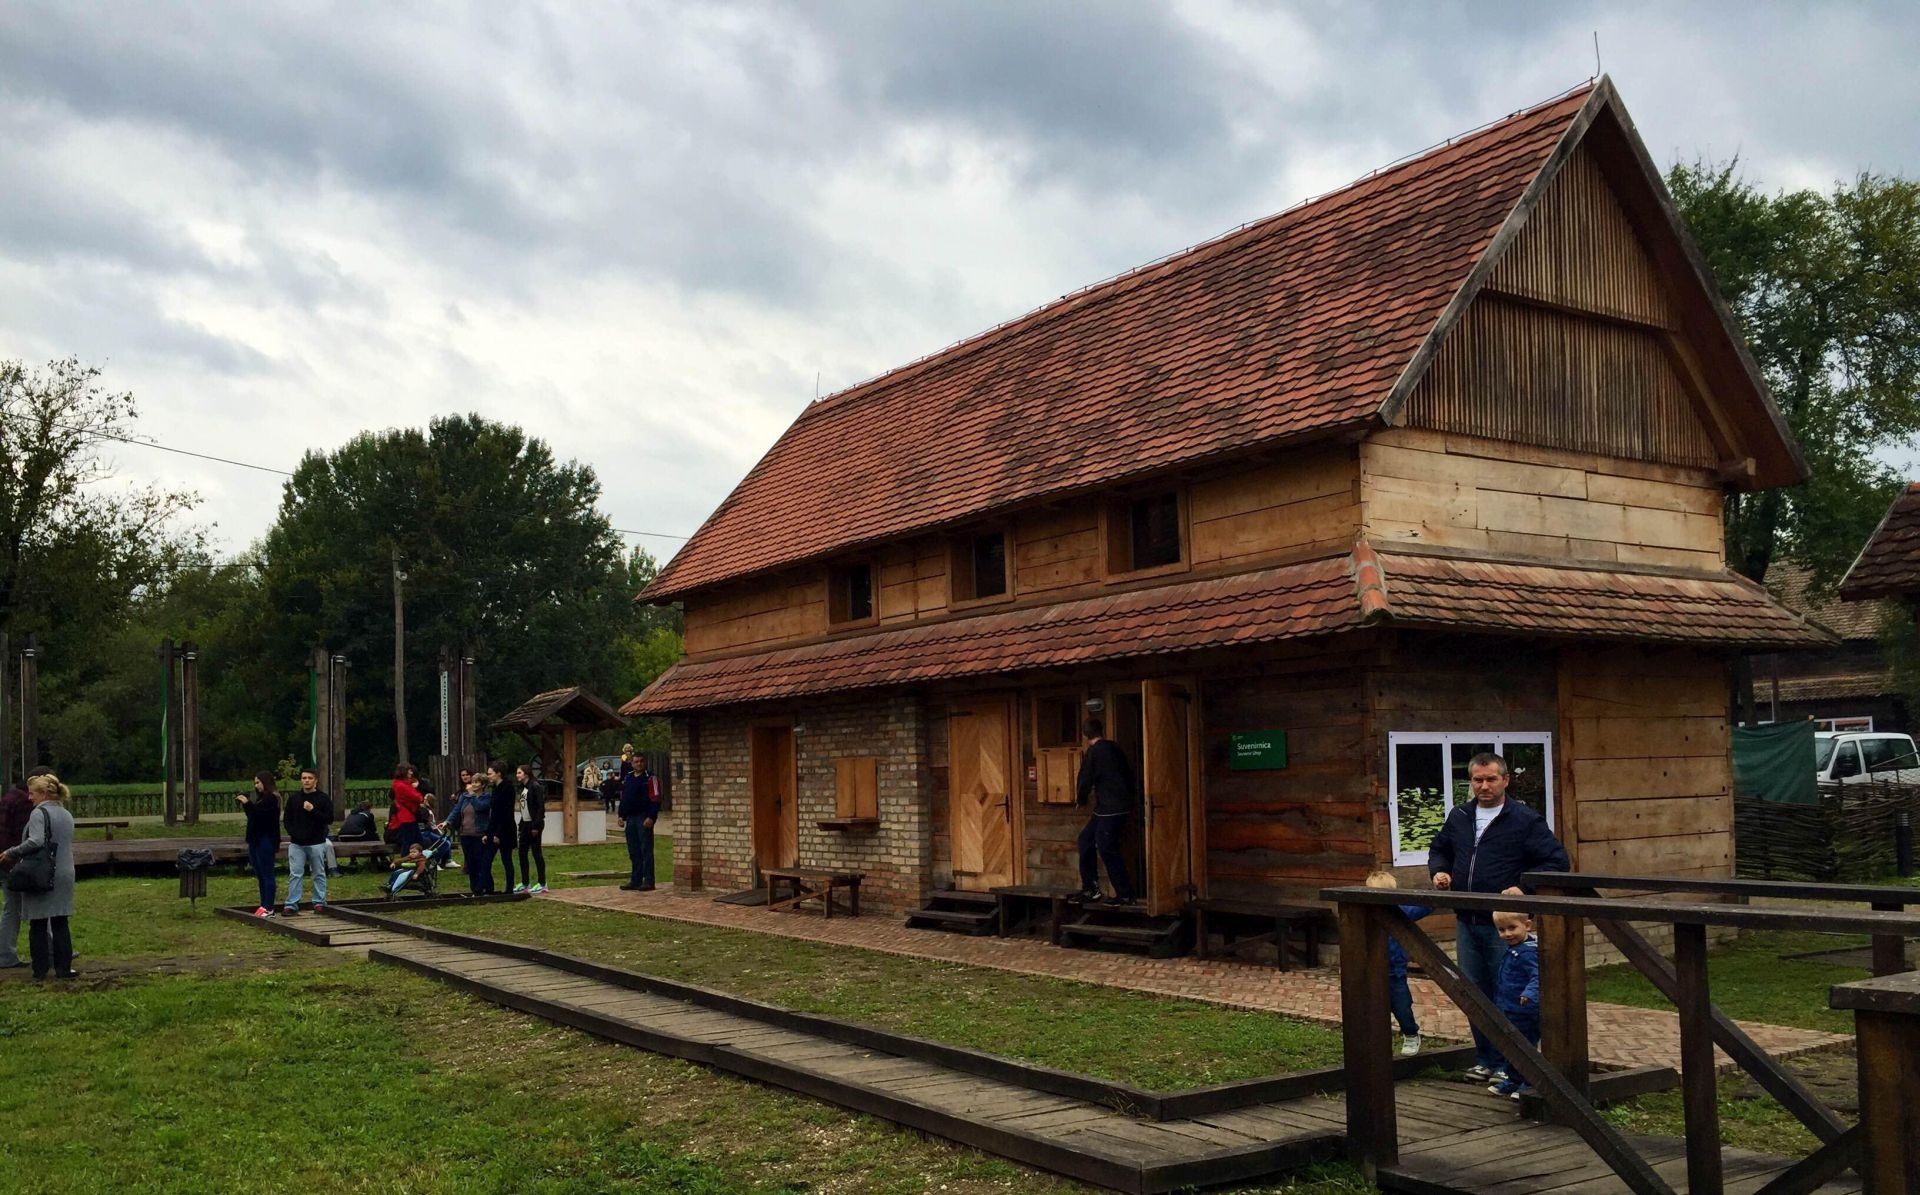 Park prirode Lonjsko polje dobio novi centar za posjetitelje Krapje